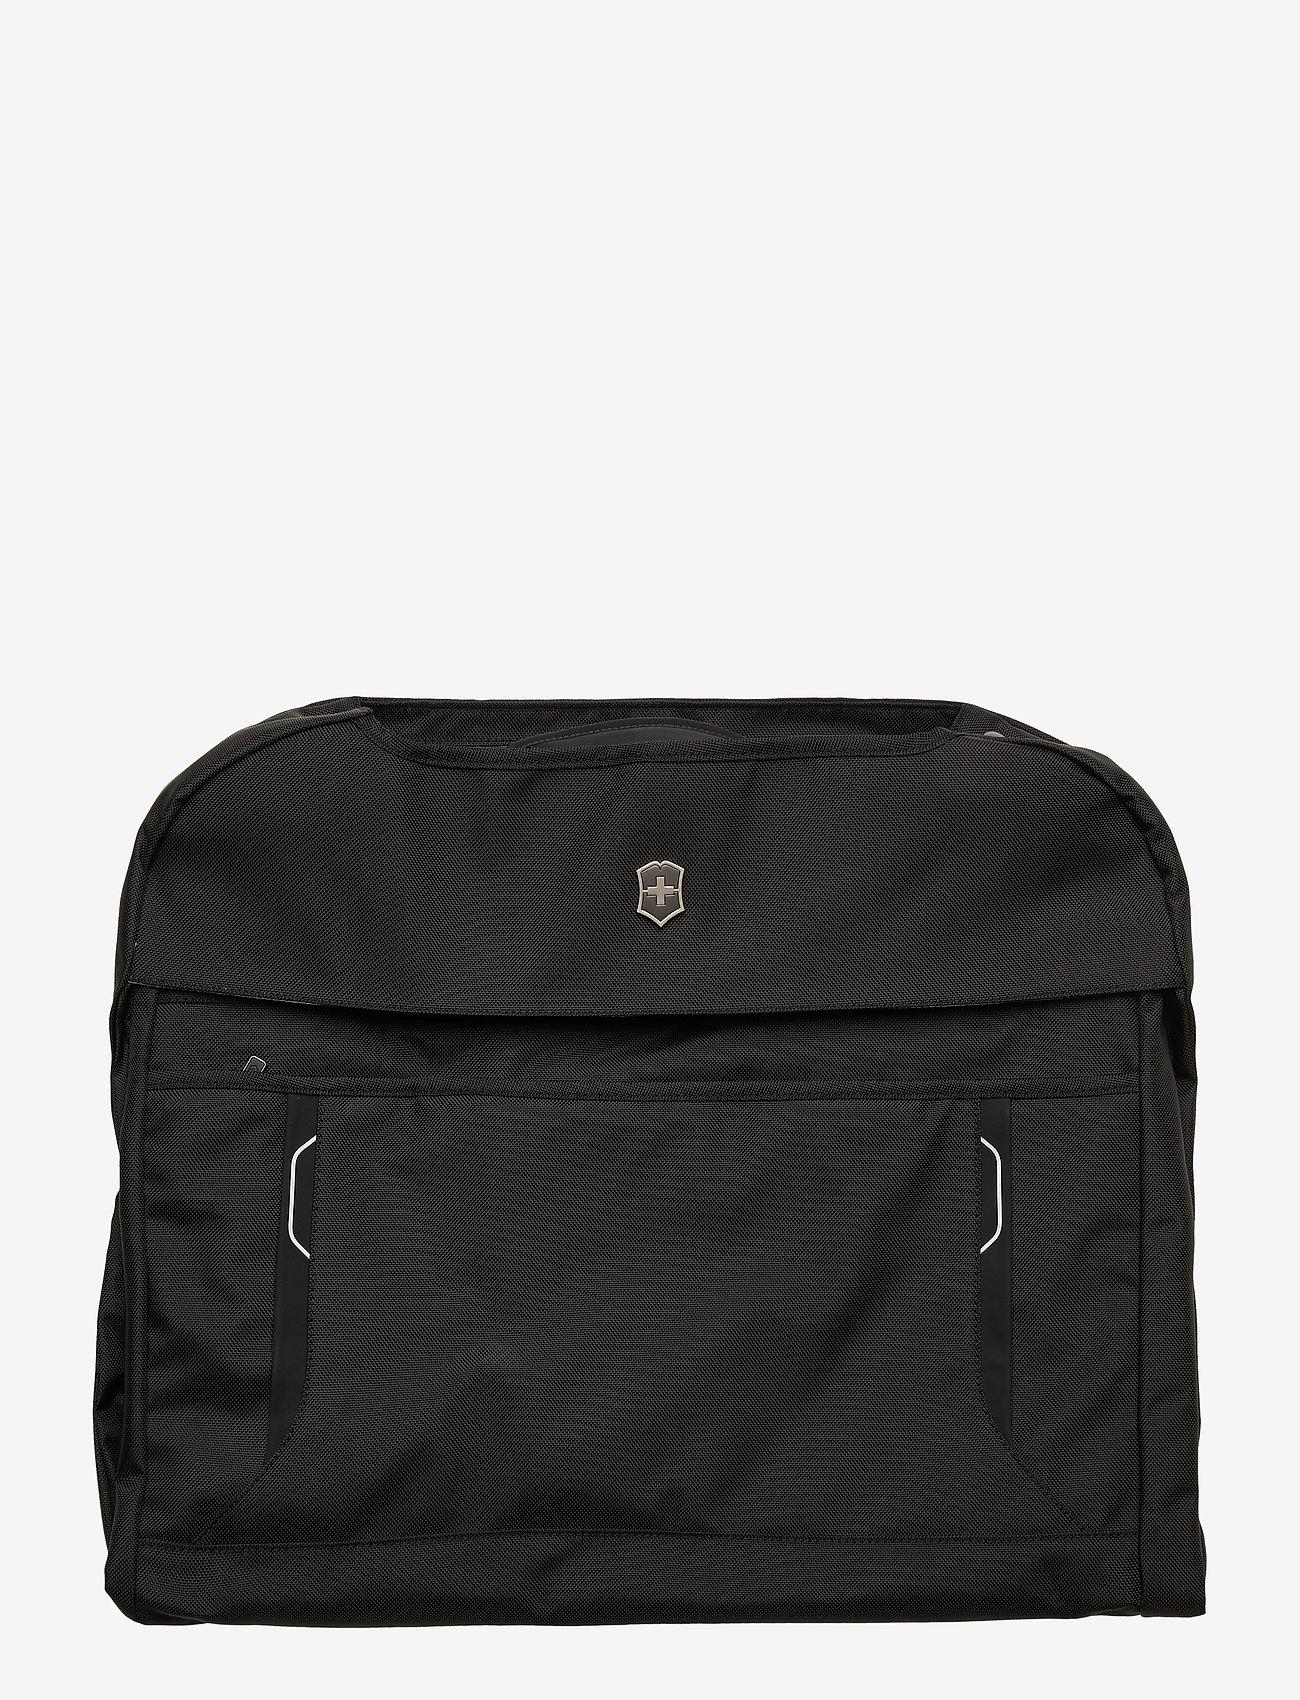 Victorinox - Werks Traveler 6.0, Garment Sleeve, Black - travel accessories - black - 0